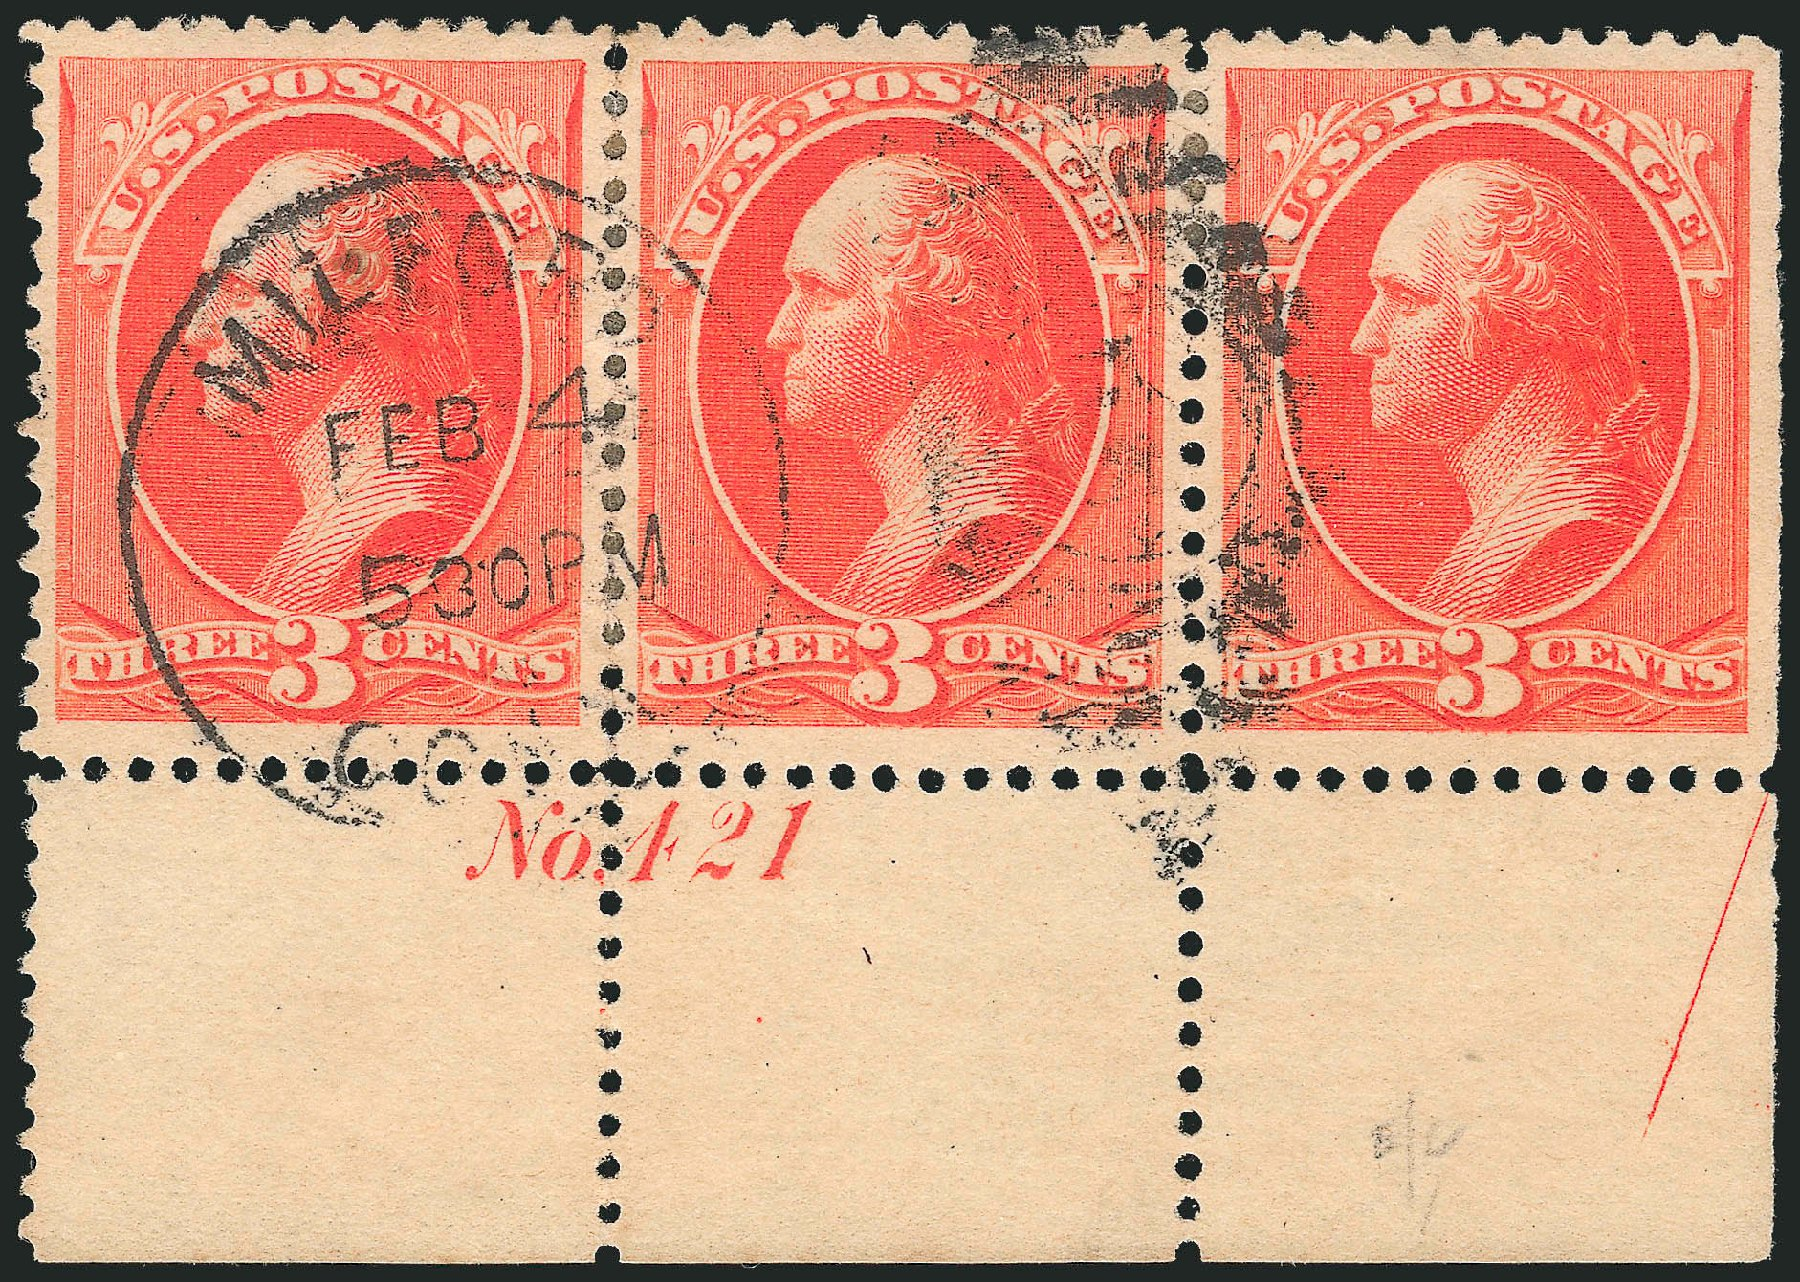 US Stamp Value Scott Catalogue #214: 1883 3c Washington. Robert Siegel Auction Galleries, Dec 2013, Sale 1062, Lot 407